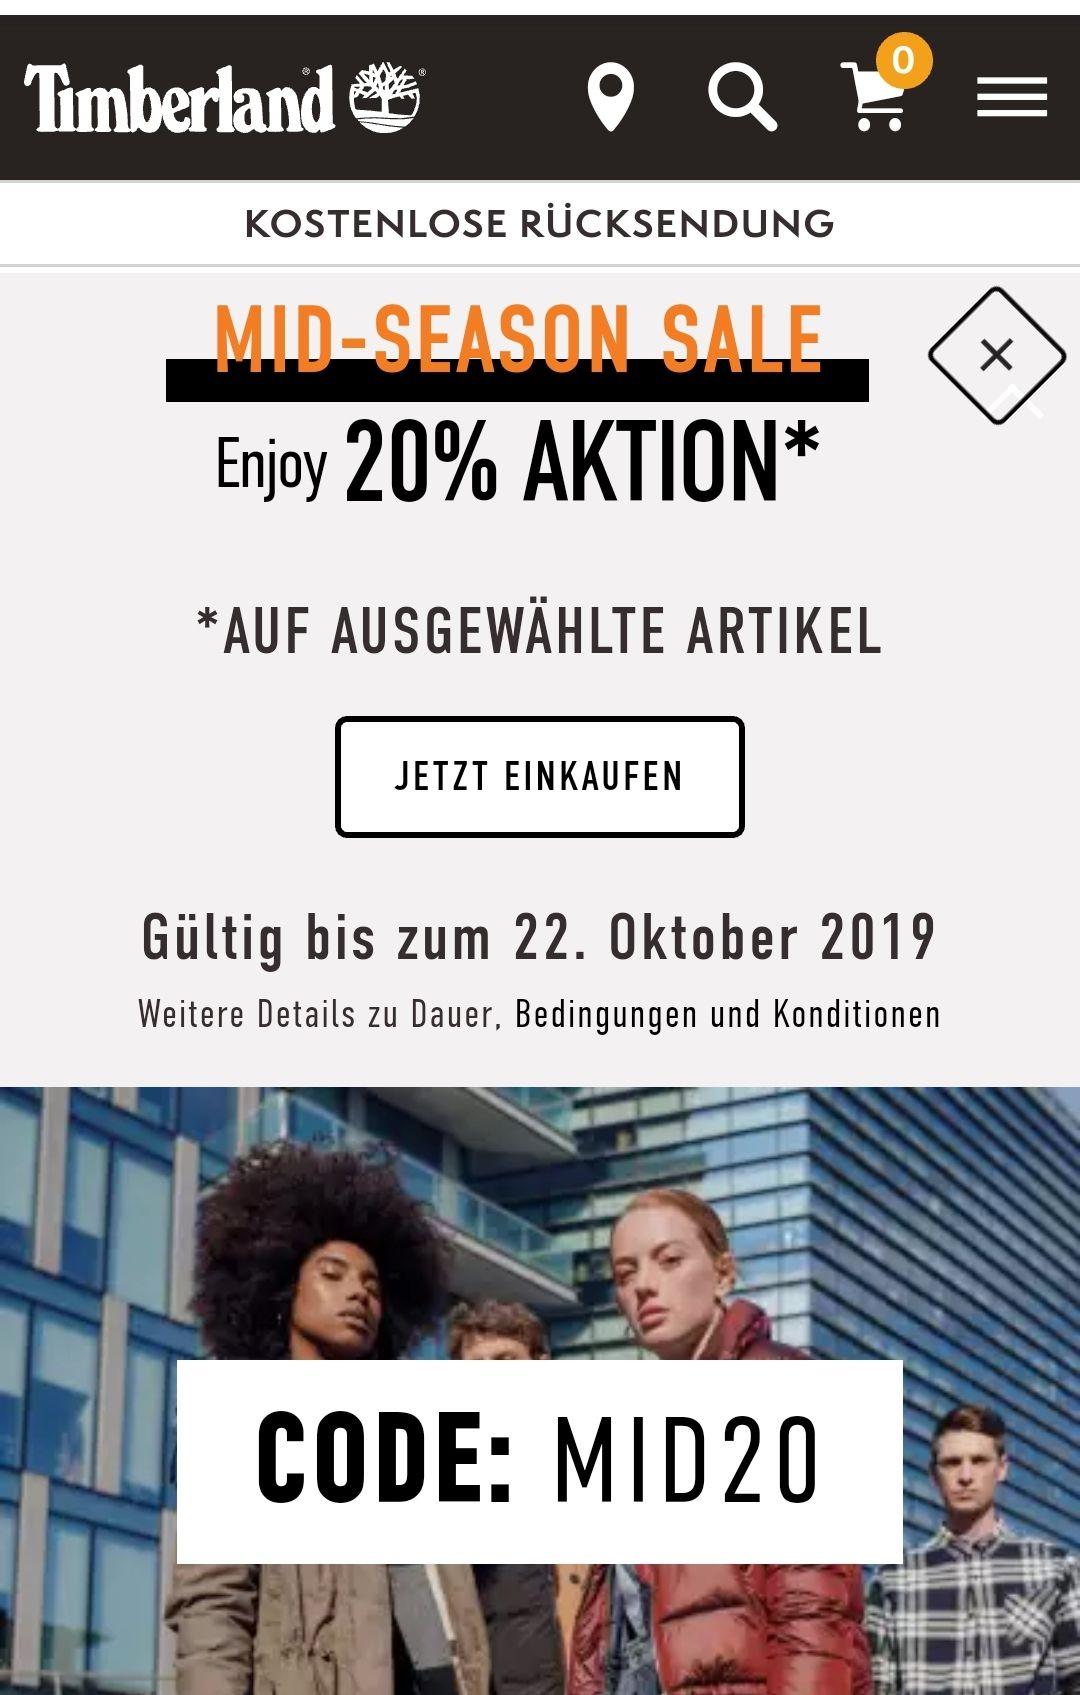 Timberland Mid-Season Sale 20% ausgewählte Artikel